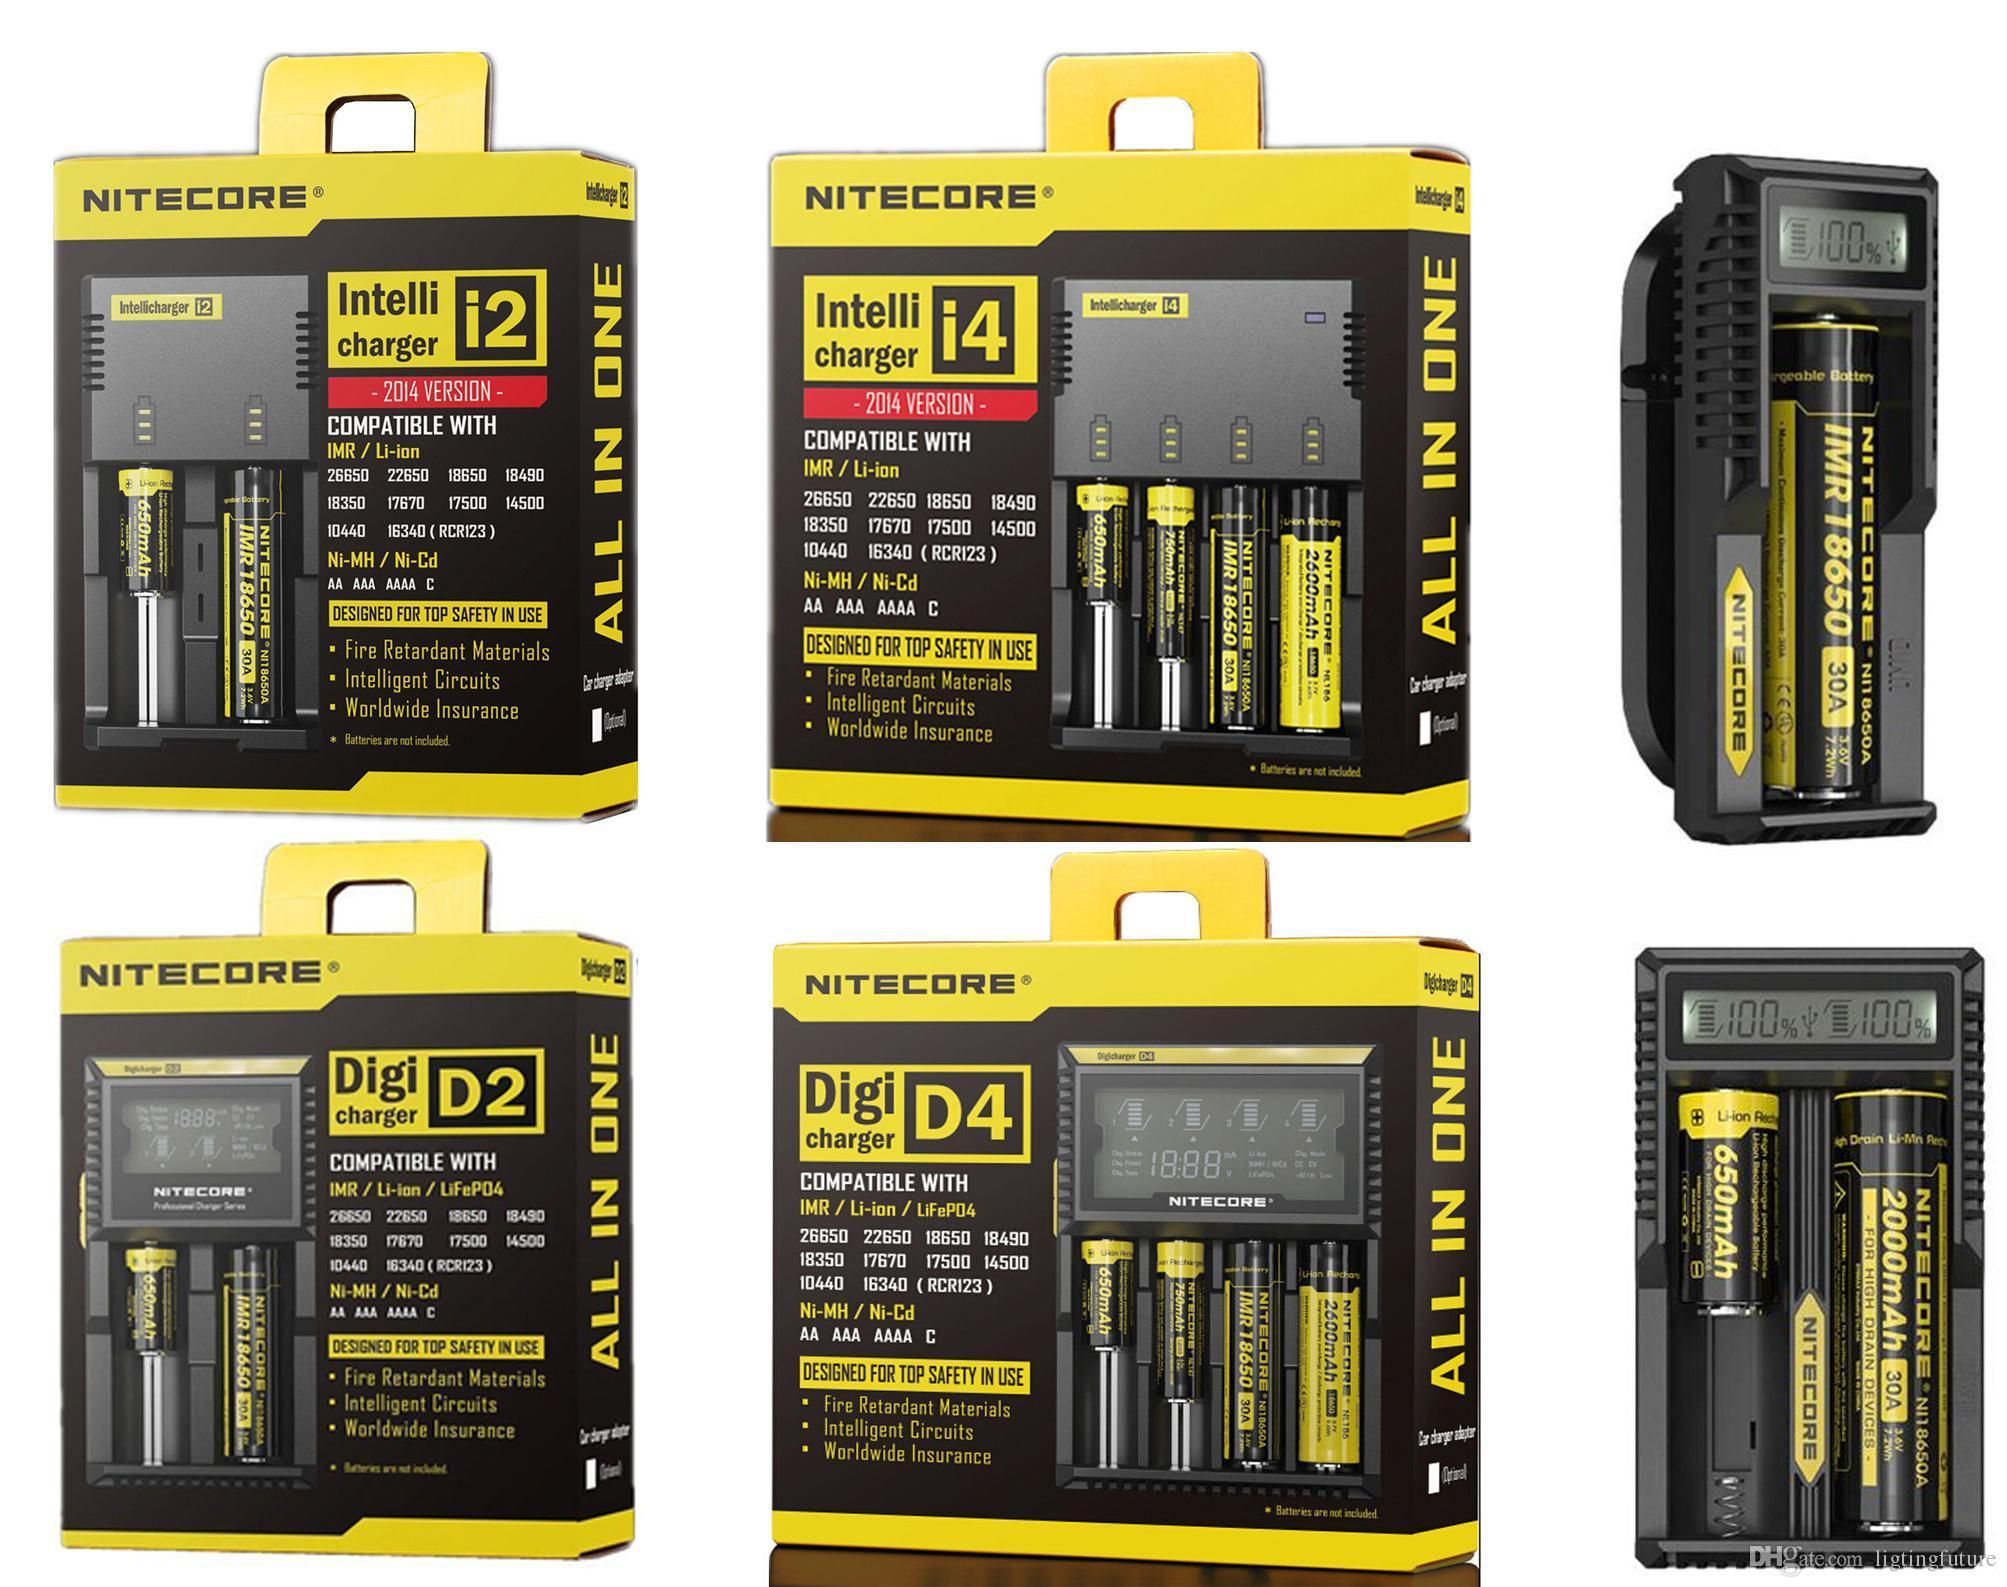 Genuíno Nitecore D2 D4 UM10 UM20 Nova I2 I4 Digi Charger Intellicharger Display LCD E Cigarros Carregador para 18650 18350 18500 14500 Bateria